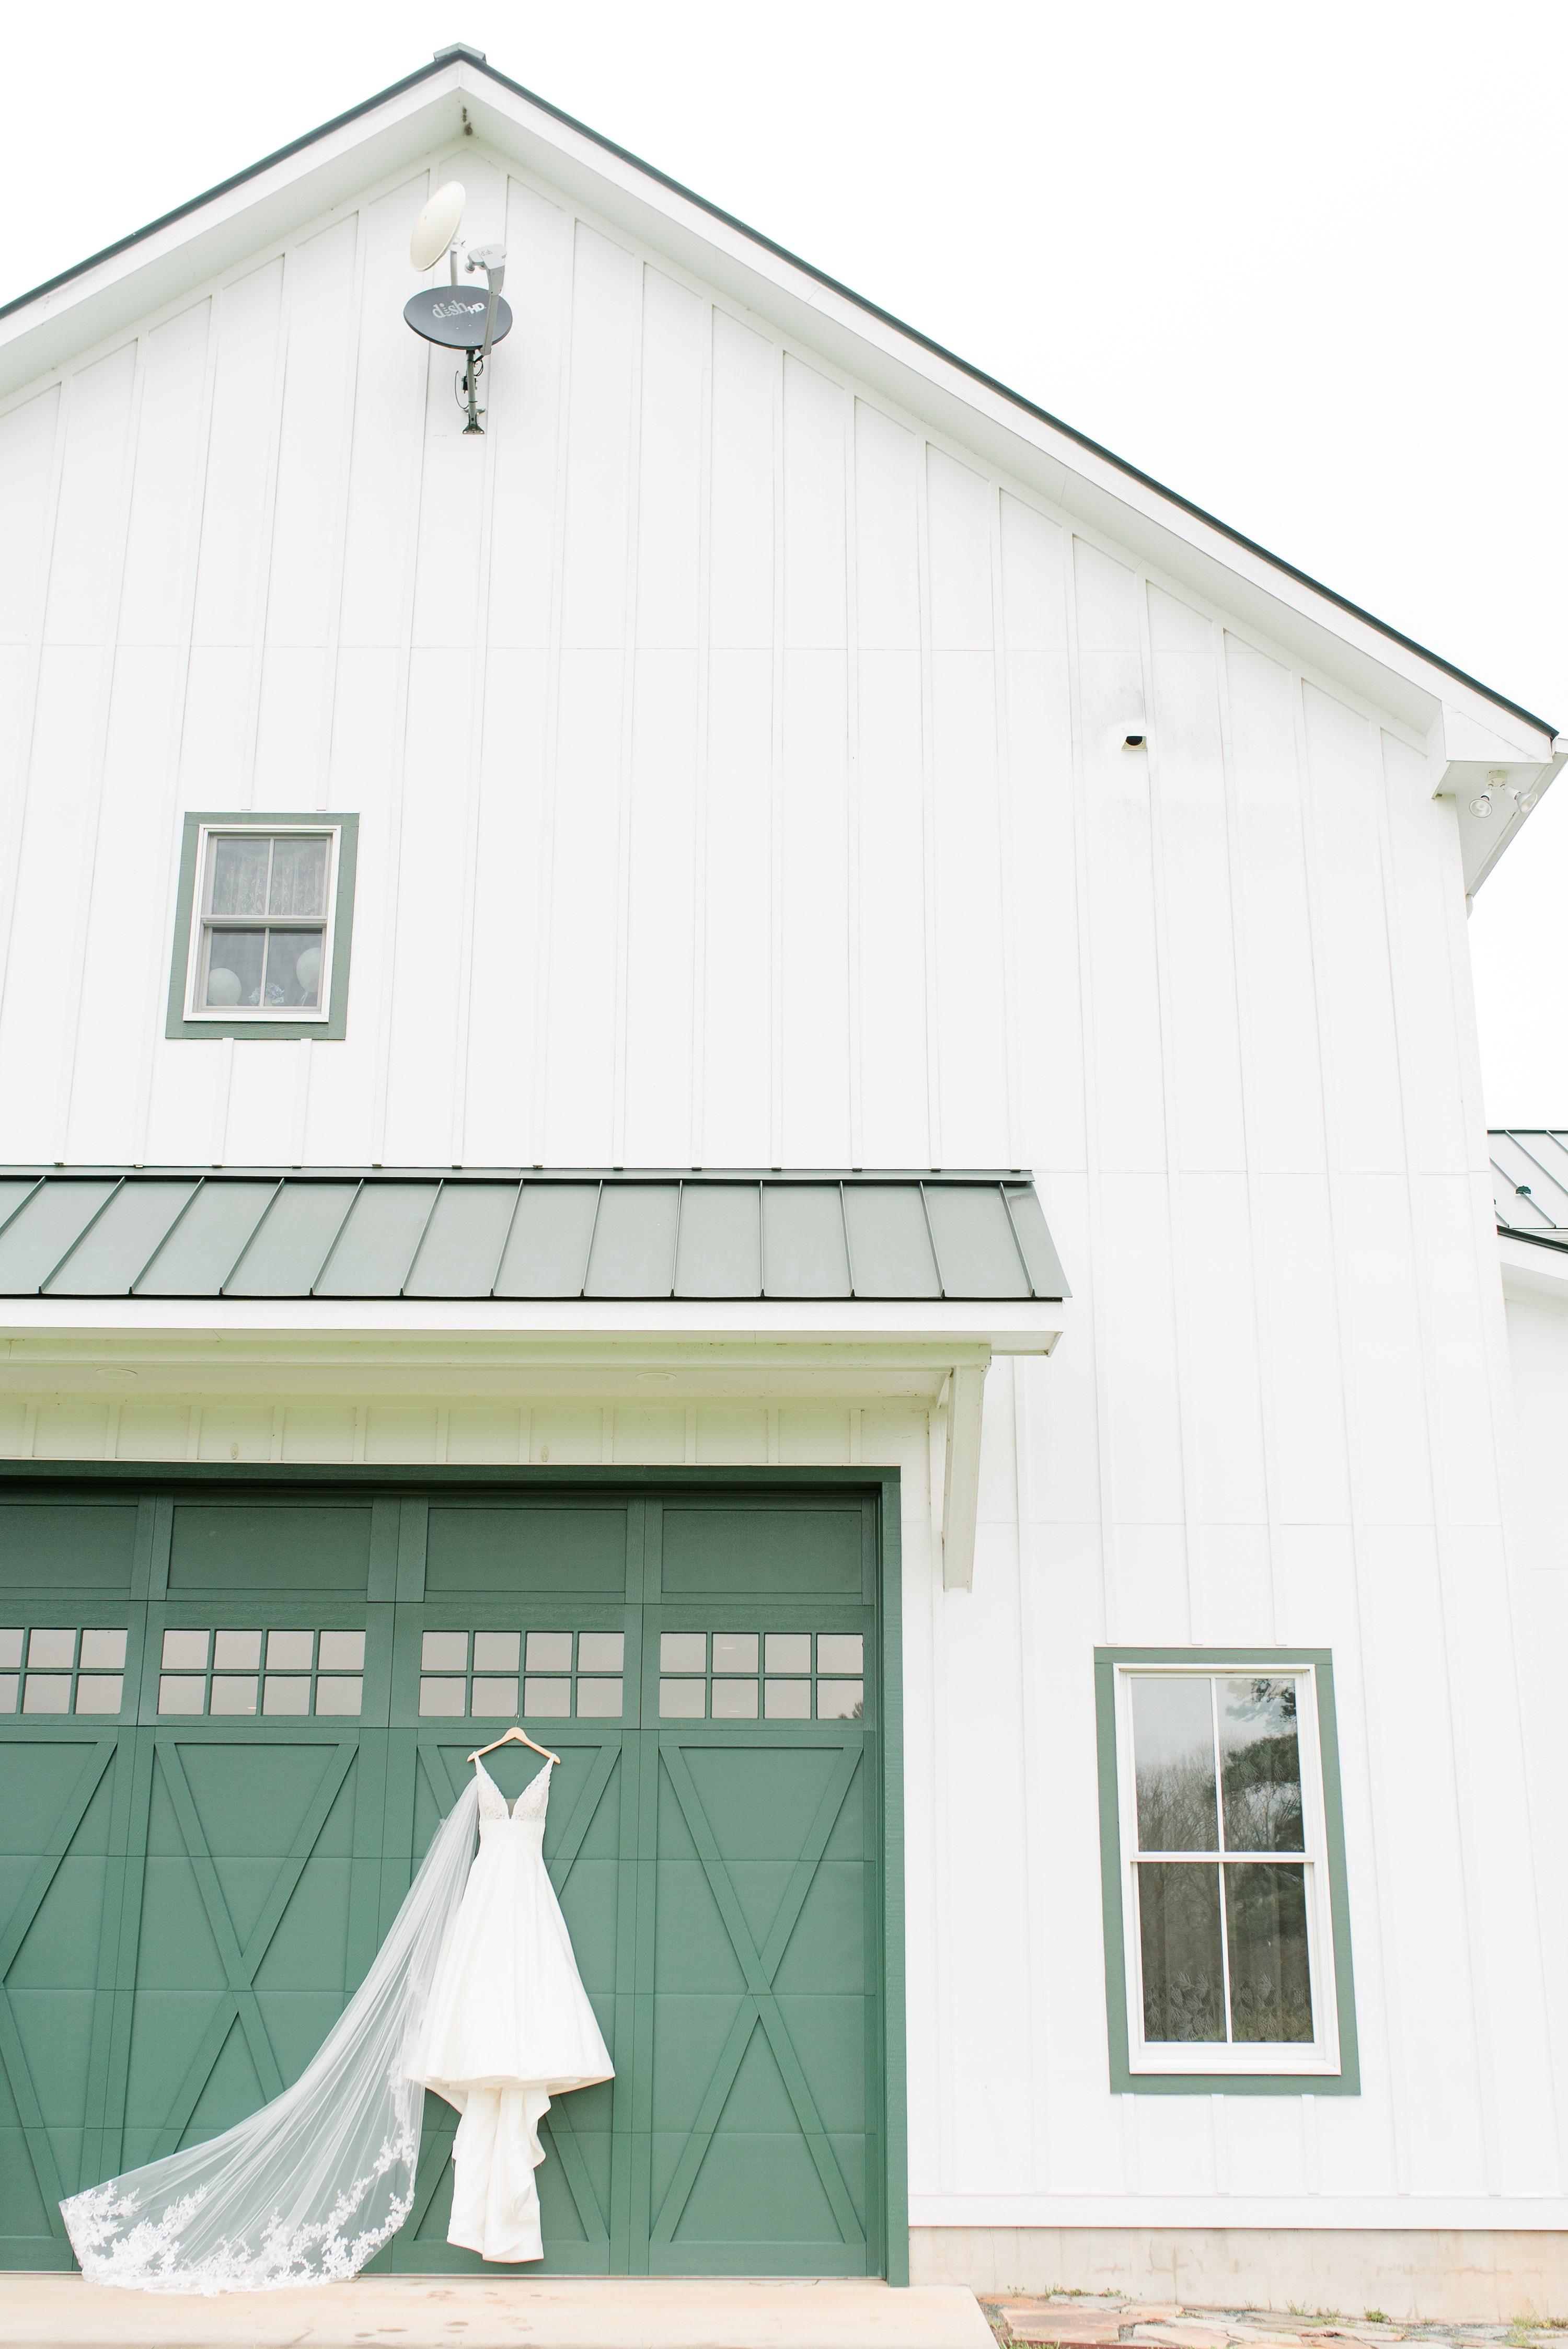 Barn,Blue Ridge Mountains,Wedding Dress,Dress,Veil,Wedding Veil,edgewood barn